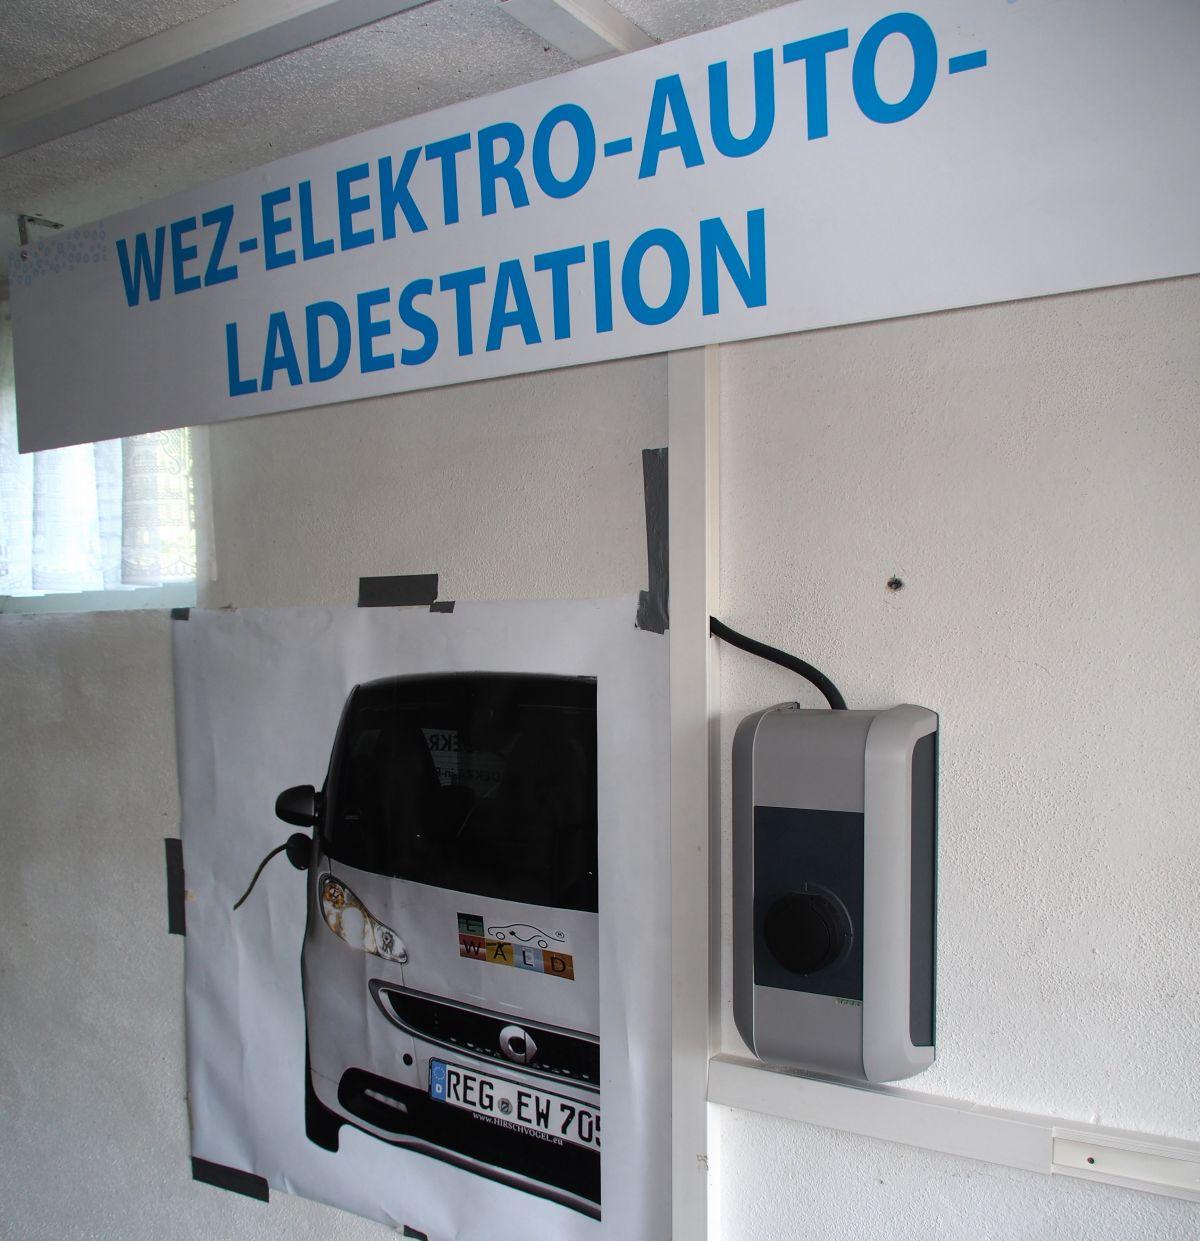 wez-elektroauto-ladestation-enerie-photovoltaik